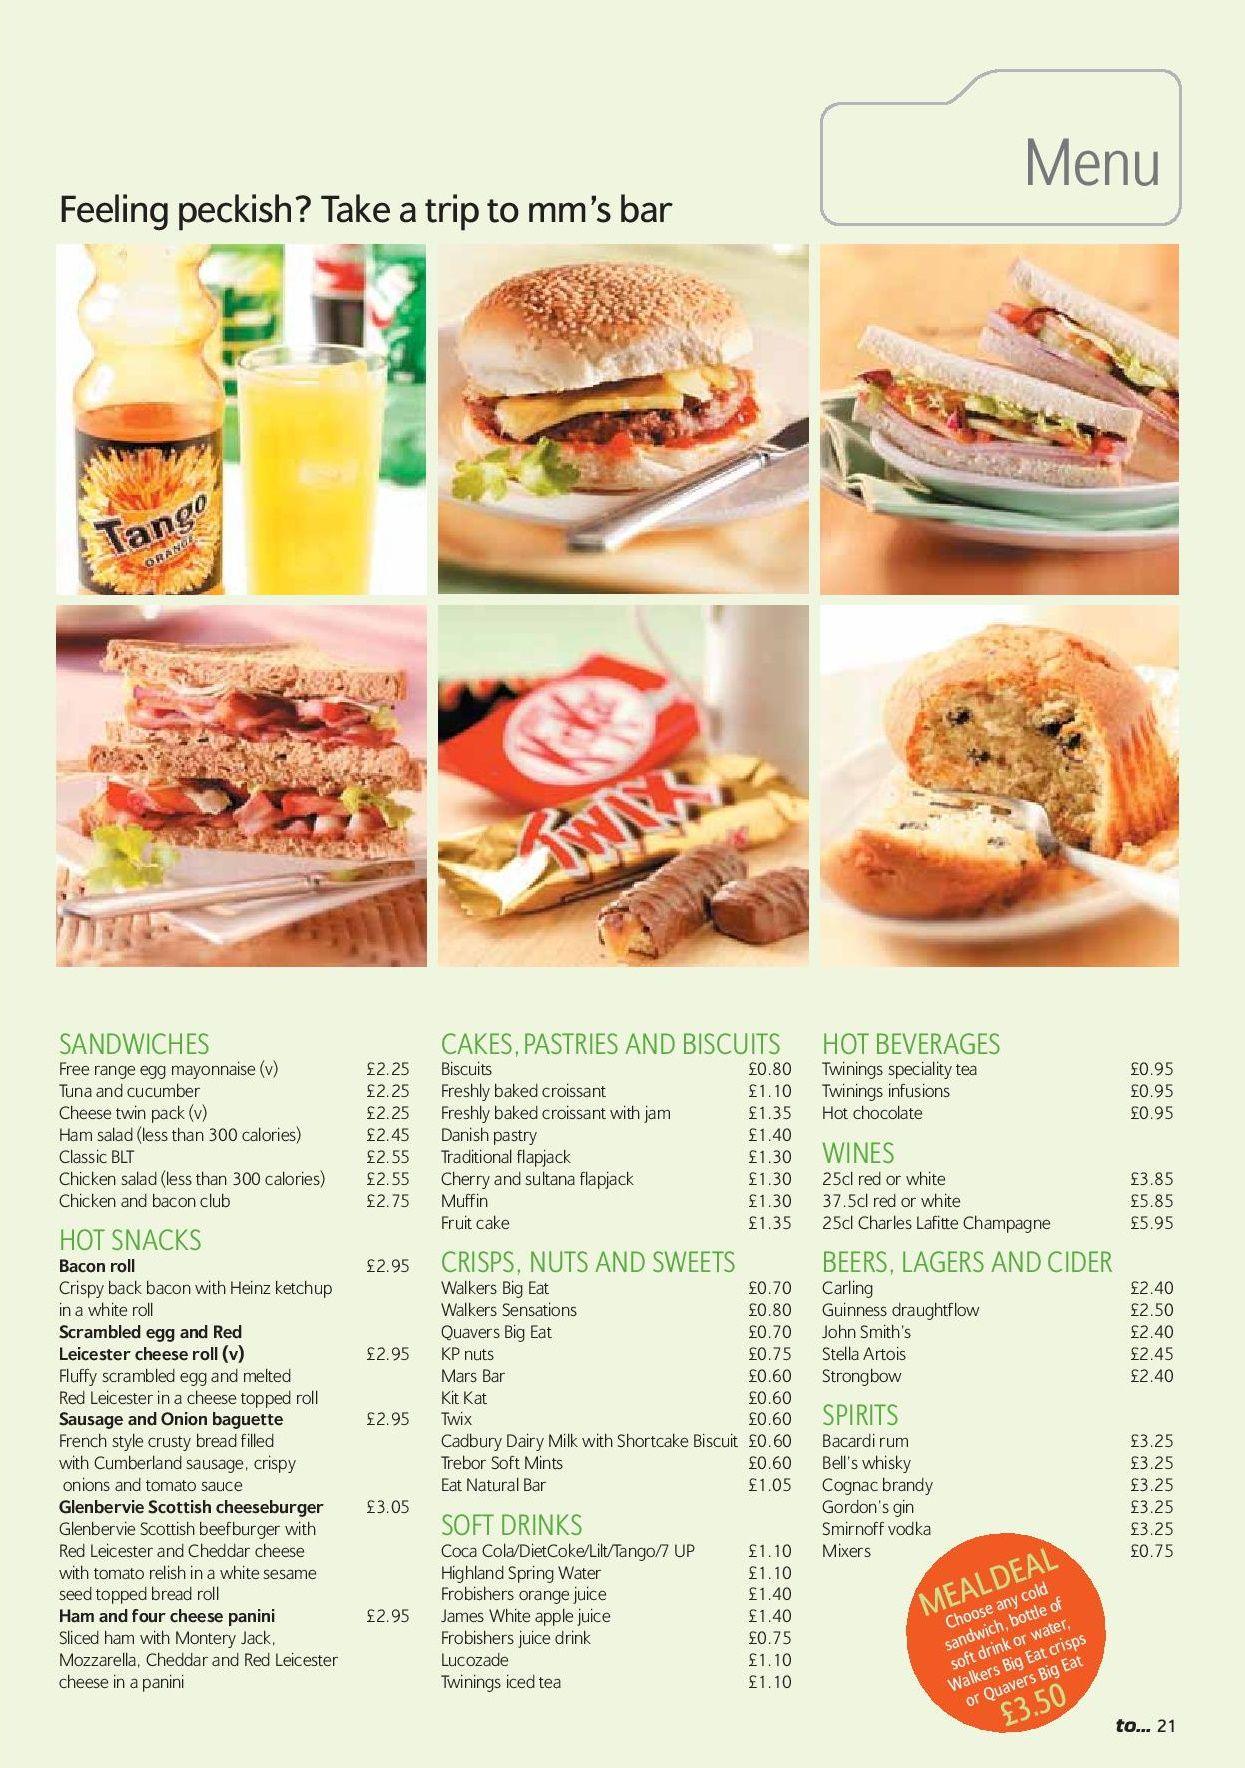 Image showing a sample of the Midland Mainline MM's bar menu circa 2006.